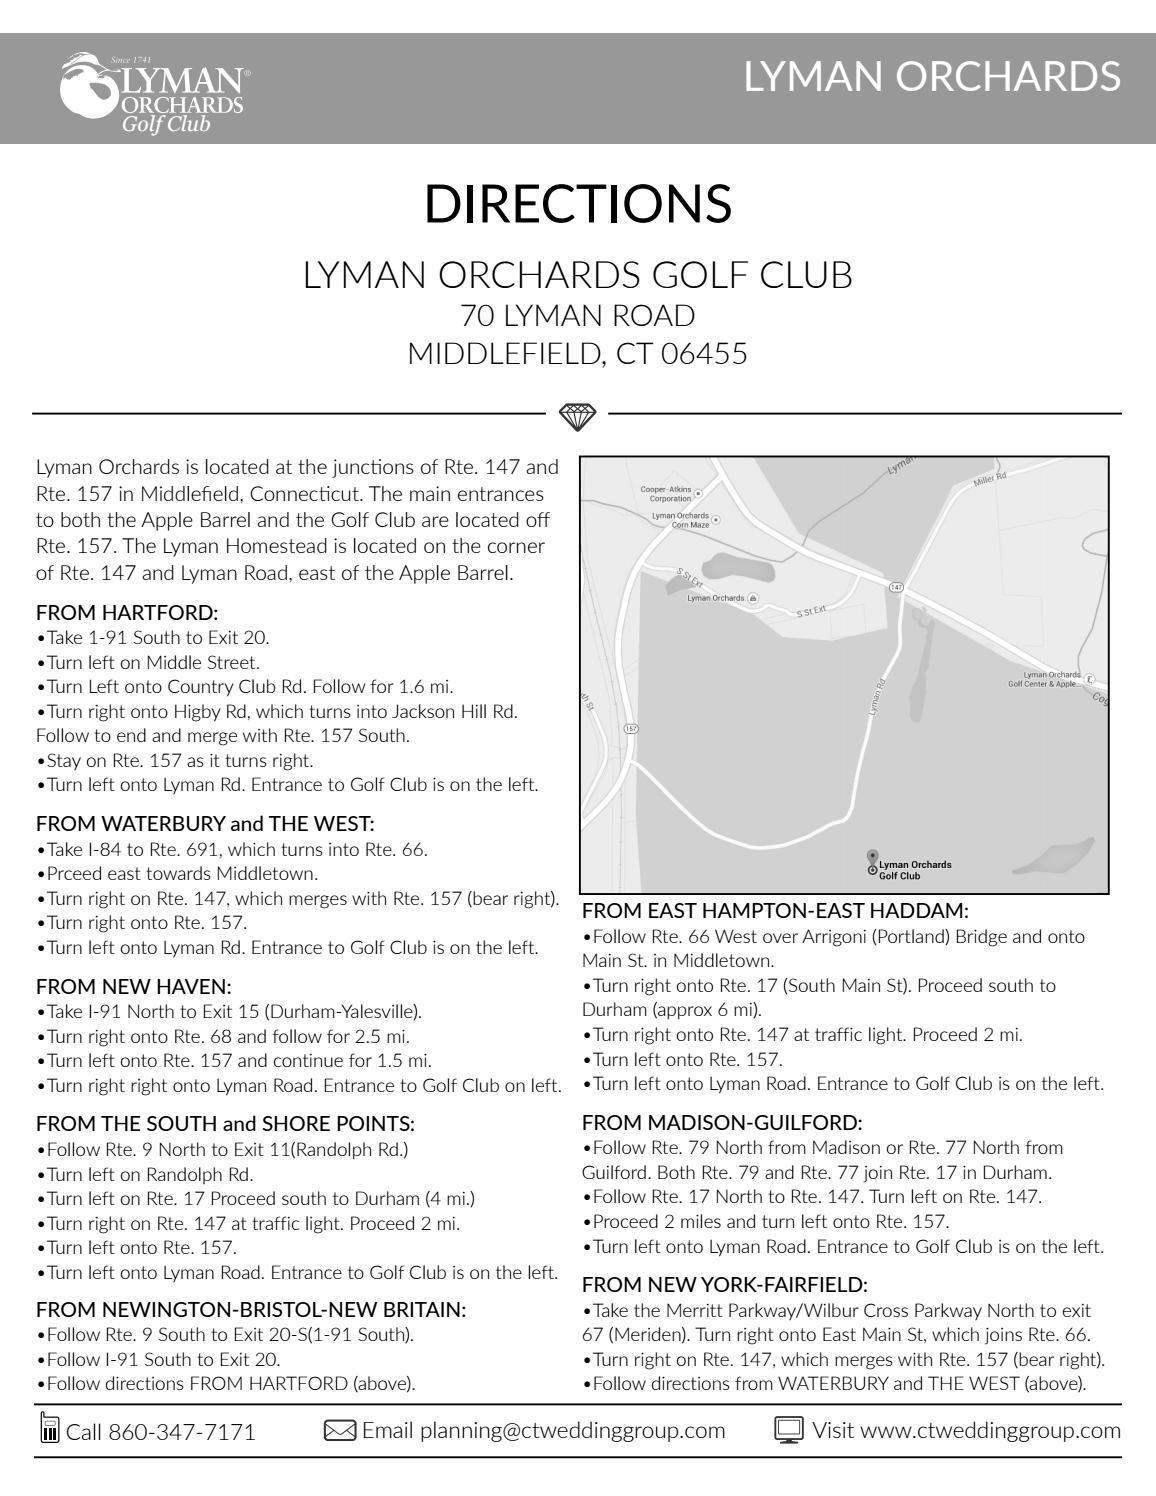 117 13018 lyman orchards golf club directions by Derek Brown - issuu